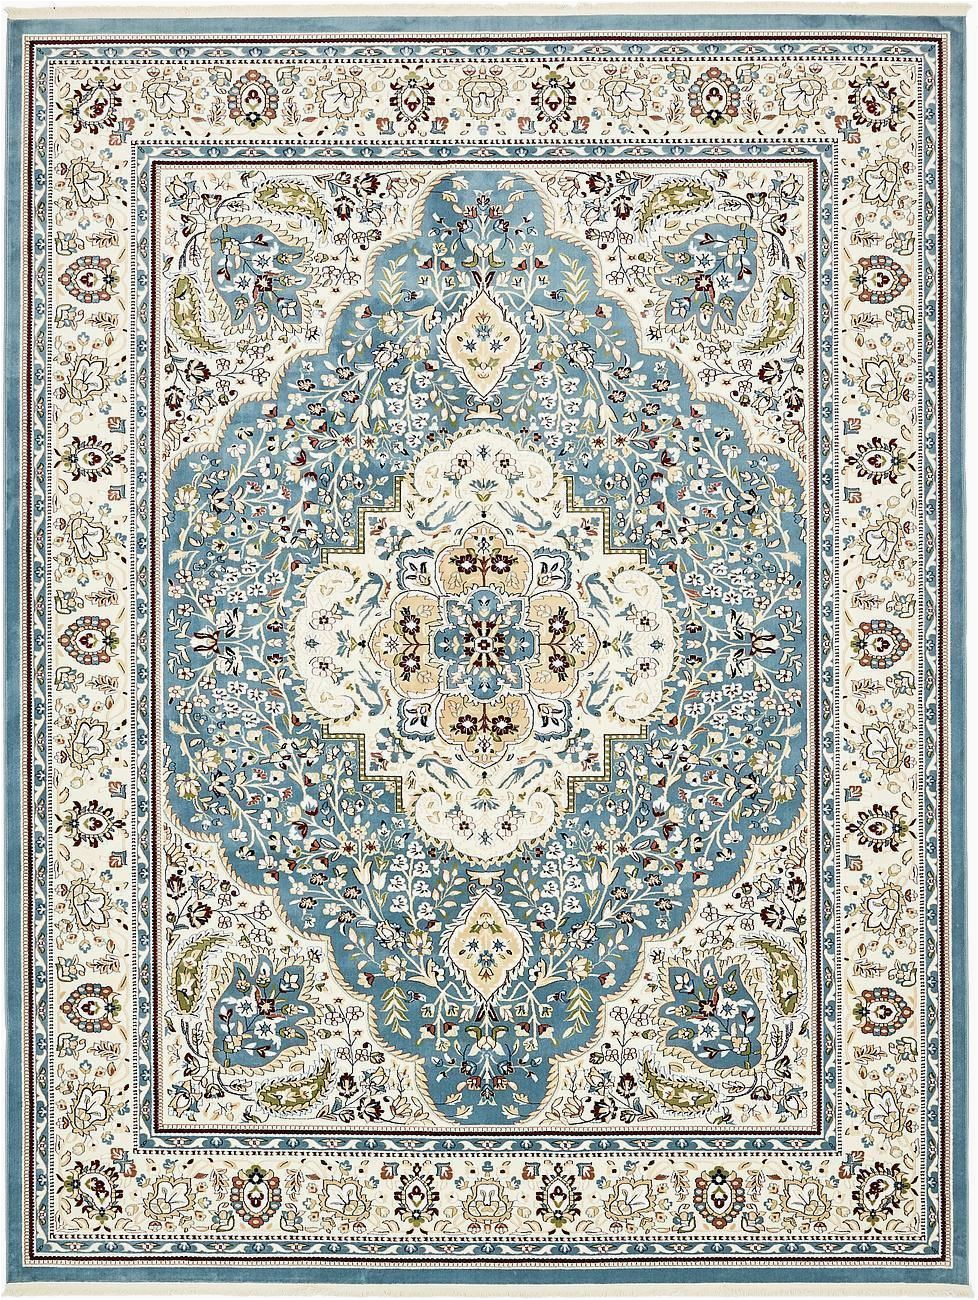 8 by 13 area Rugs Blue 13 X 19 8 Tabriz Design Rug area Rugs